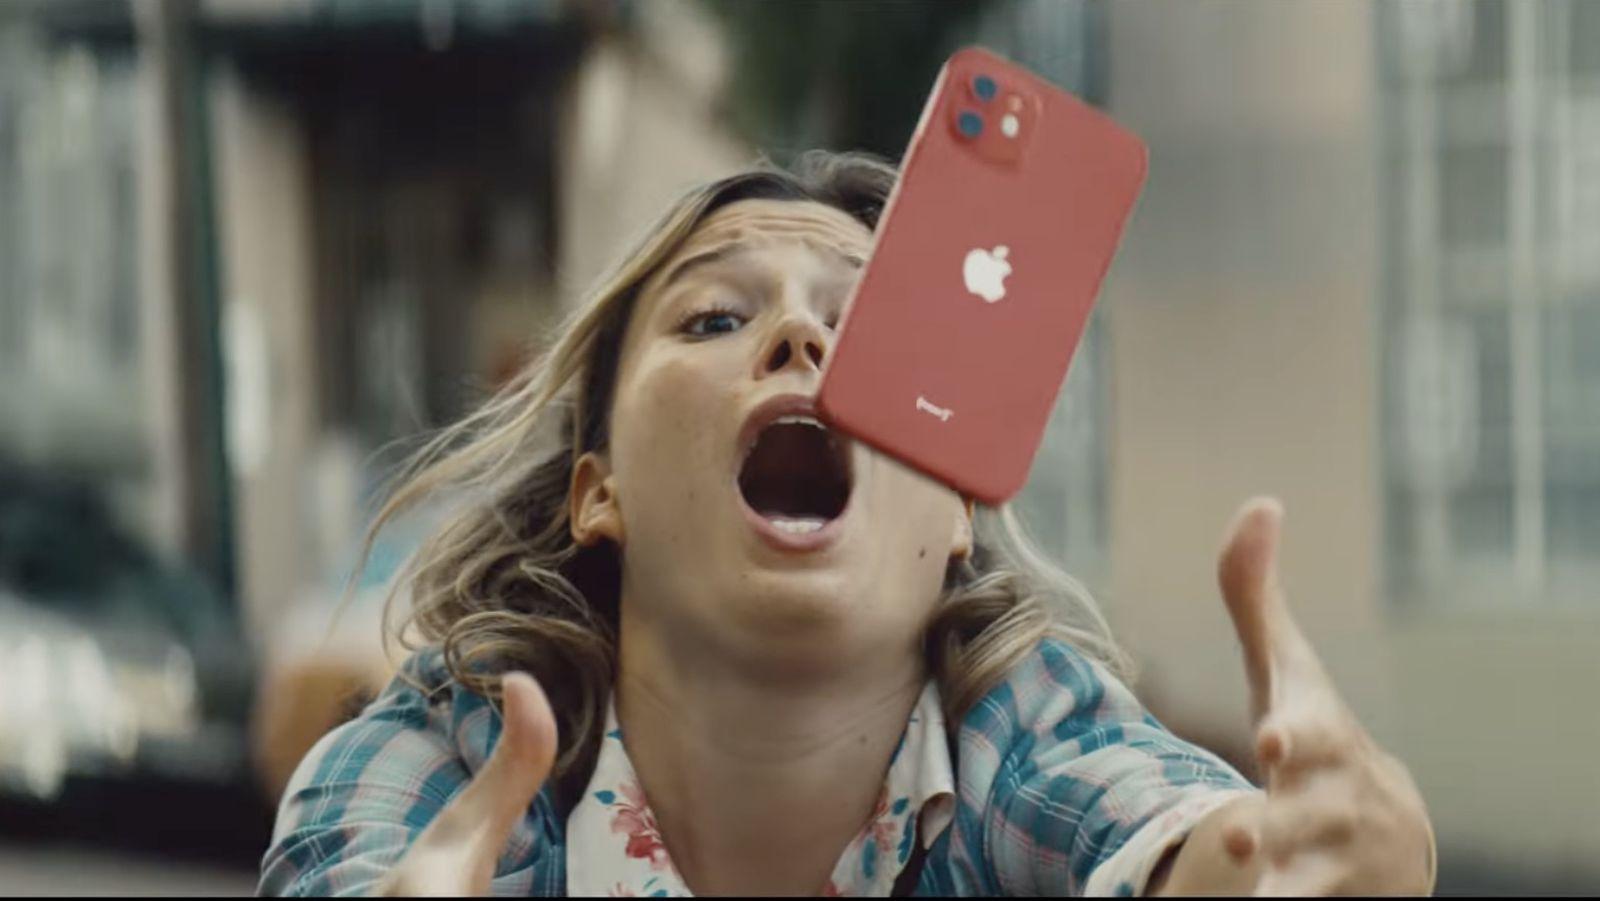 Apple Shares 'Fumble' Ad Highlighting iPhone 12 Ceramic Shield – MacRumors